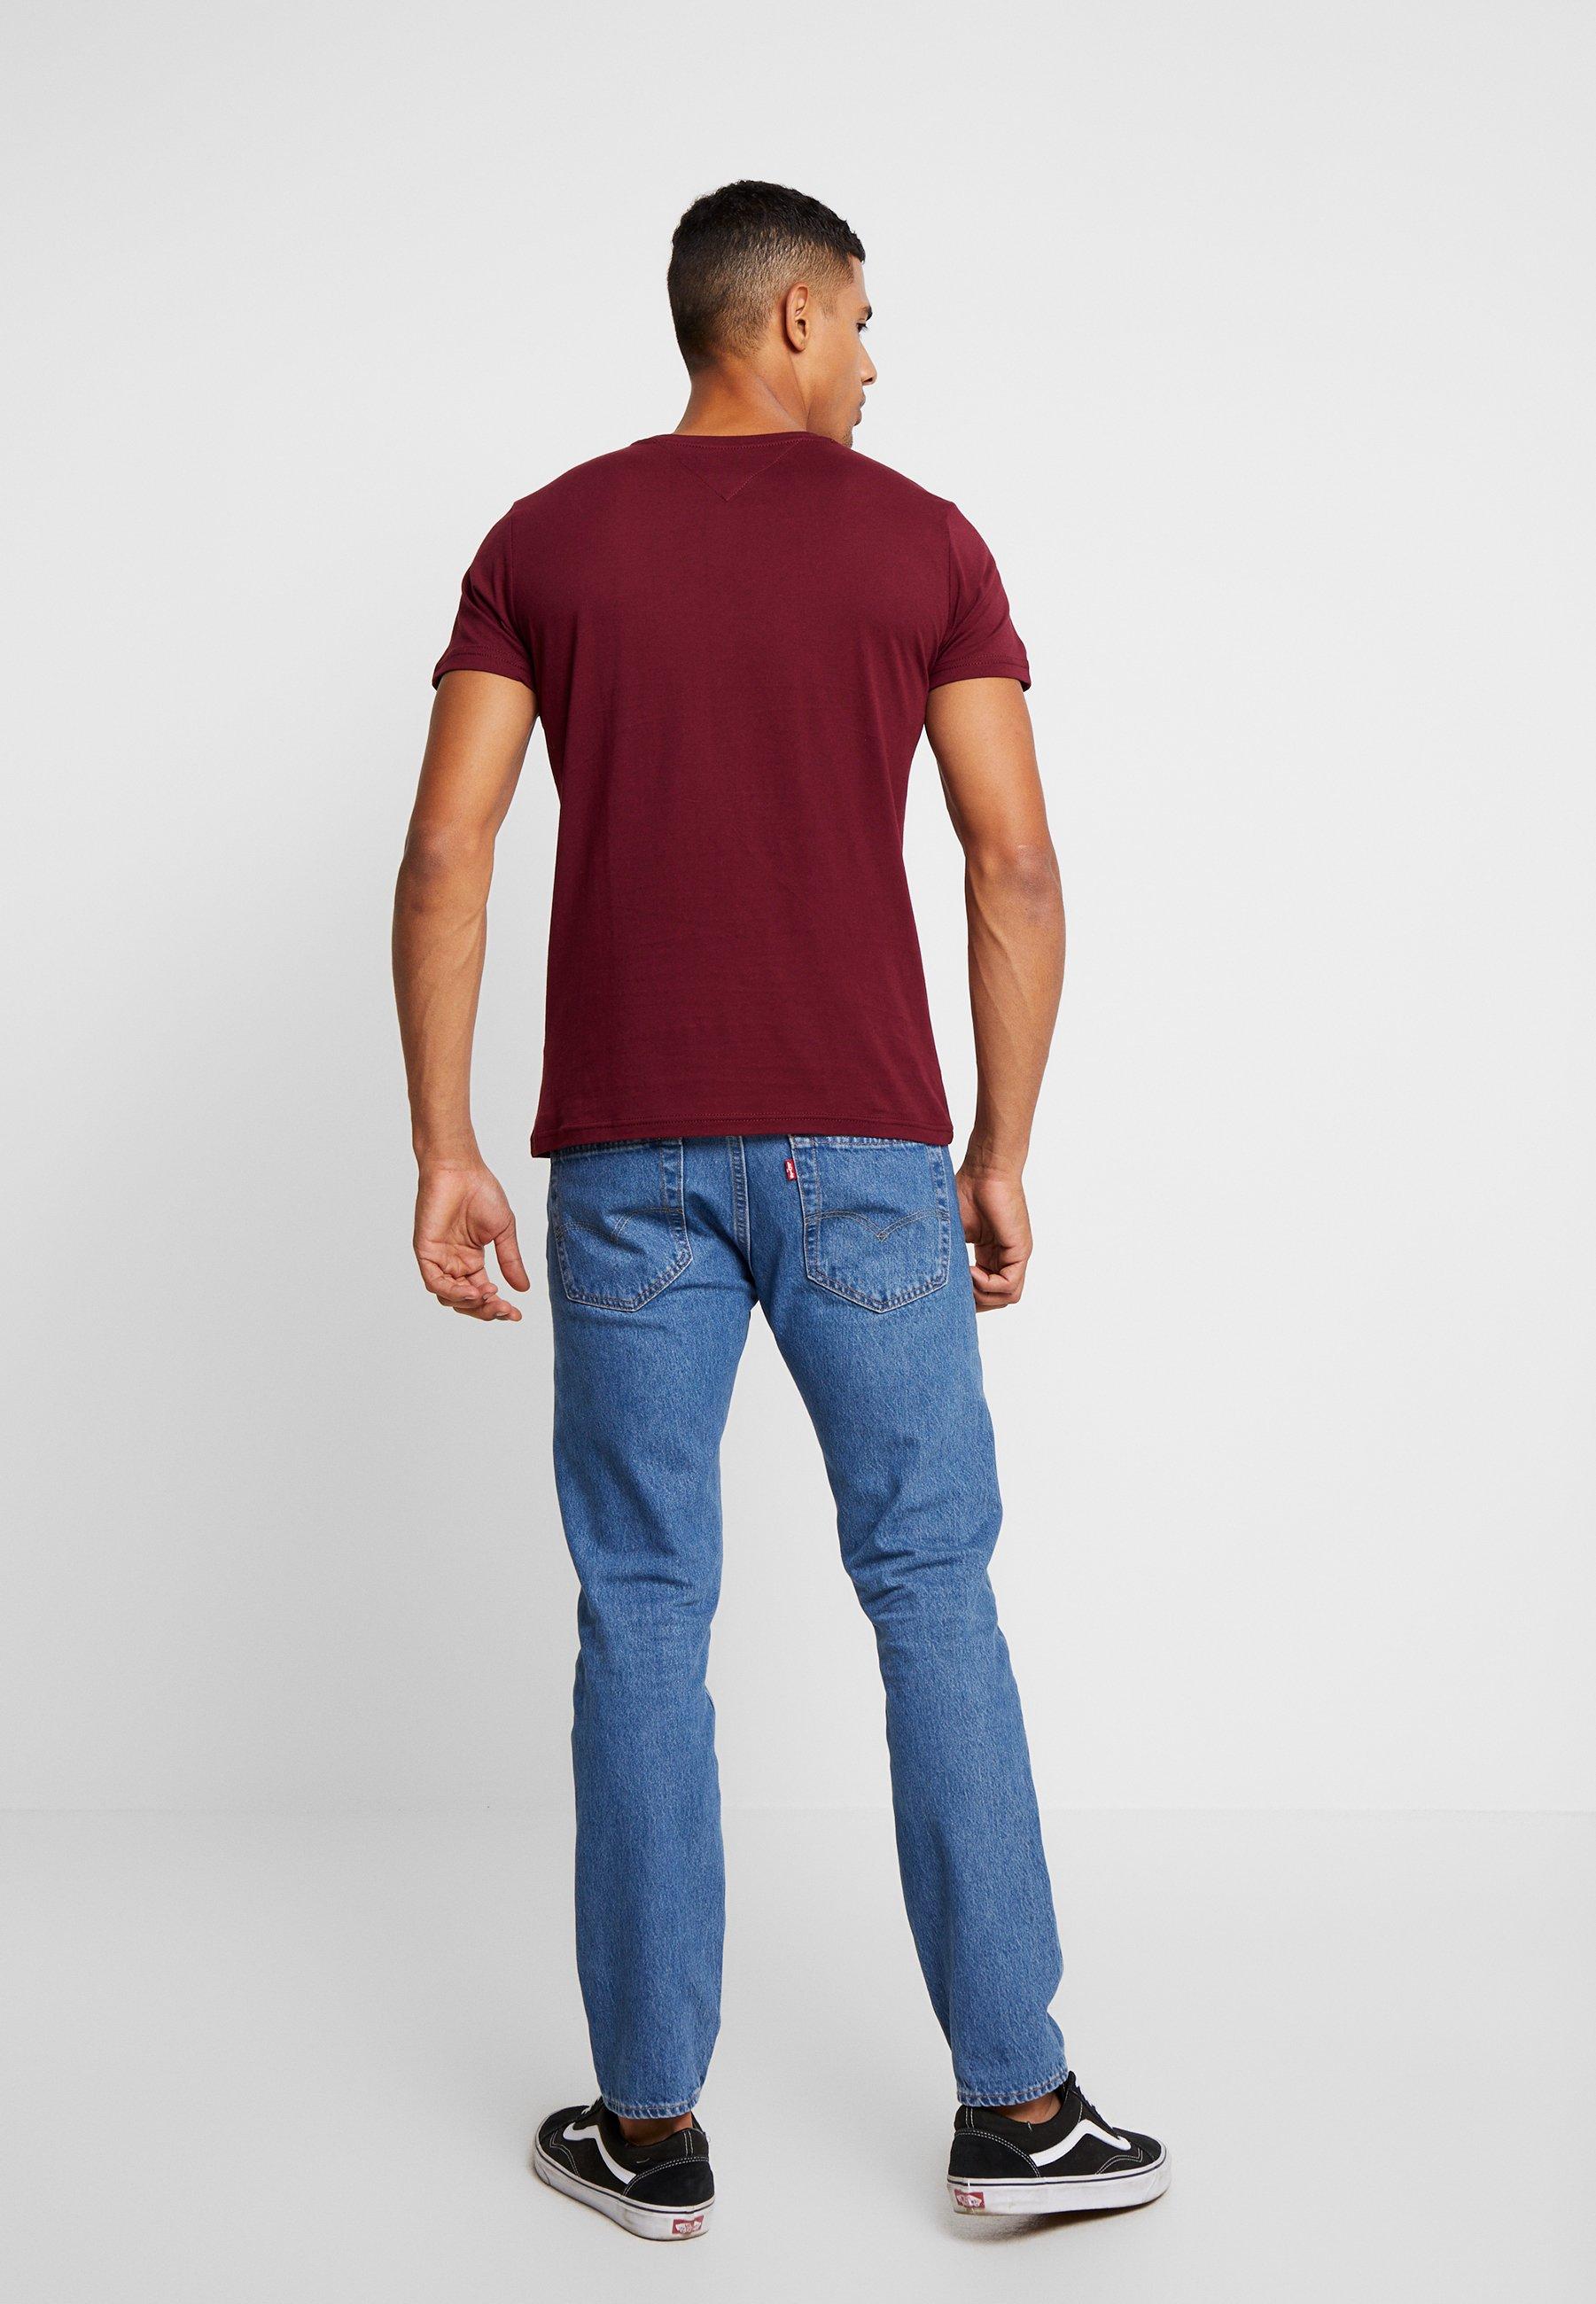 Logo Imprimé shirt Jeans Tommy Script TeeT Burgundy nwO80Pk